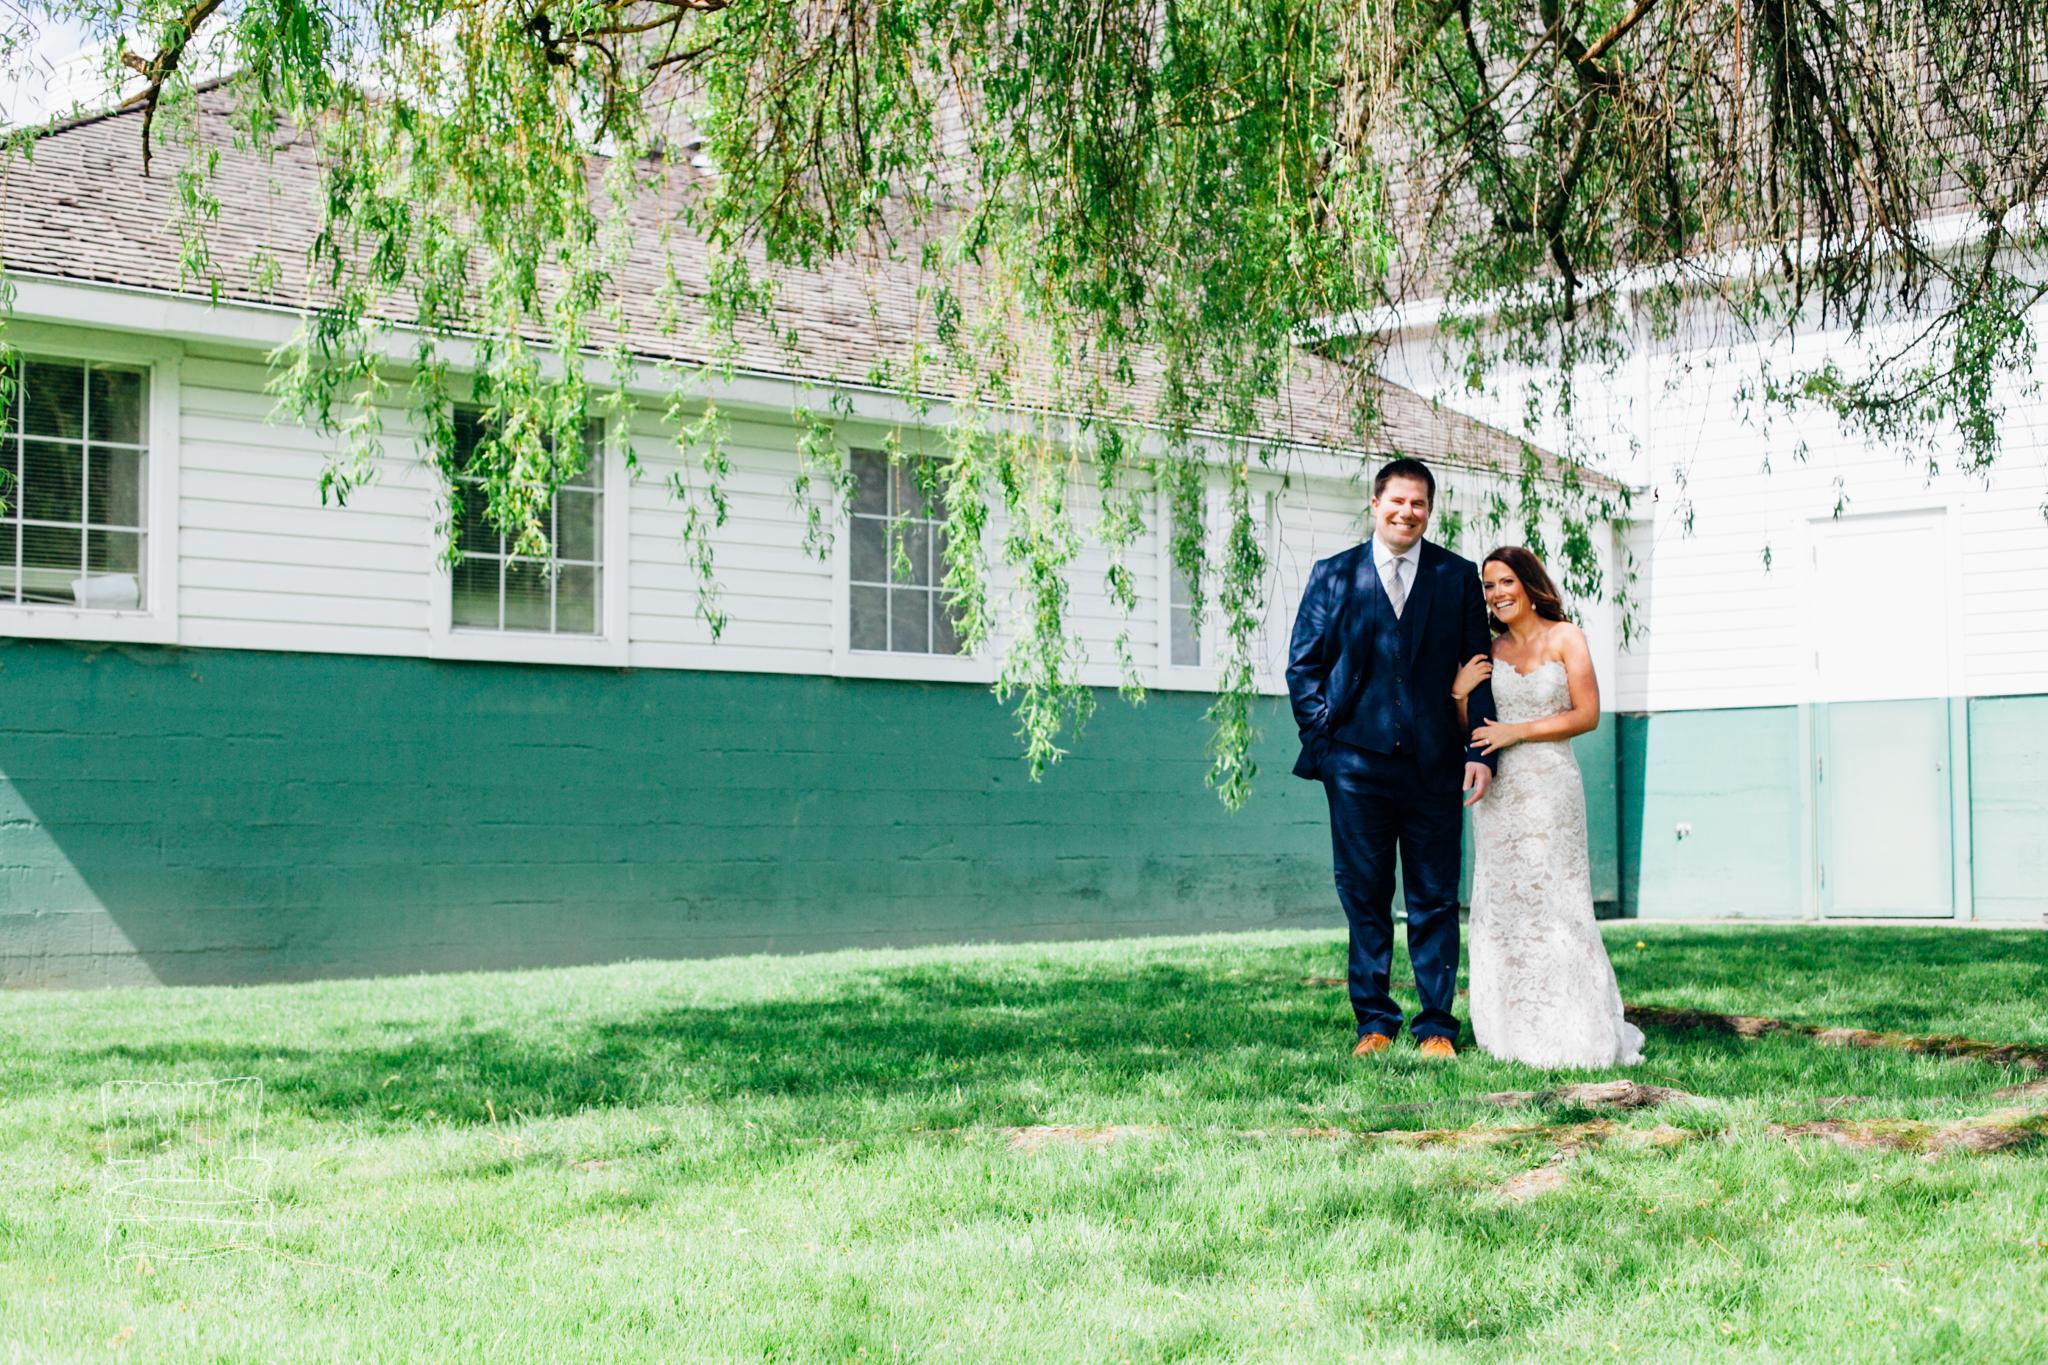 seattle-wedding-photographer-katheryn-moran-russells-bothell-wilkins-wedding-photo-25.jpg